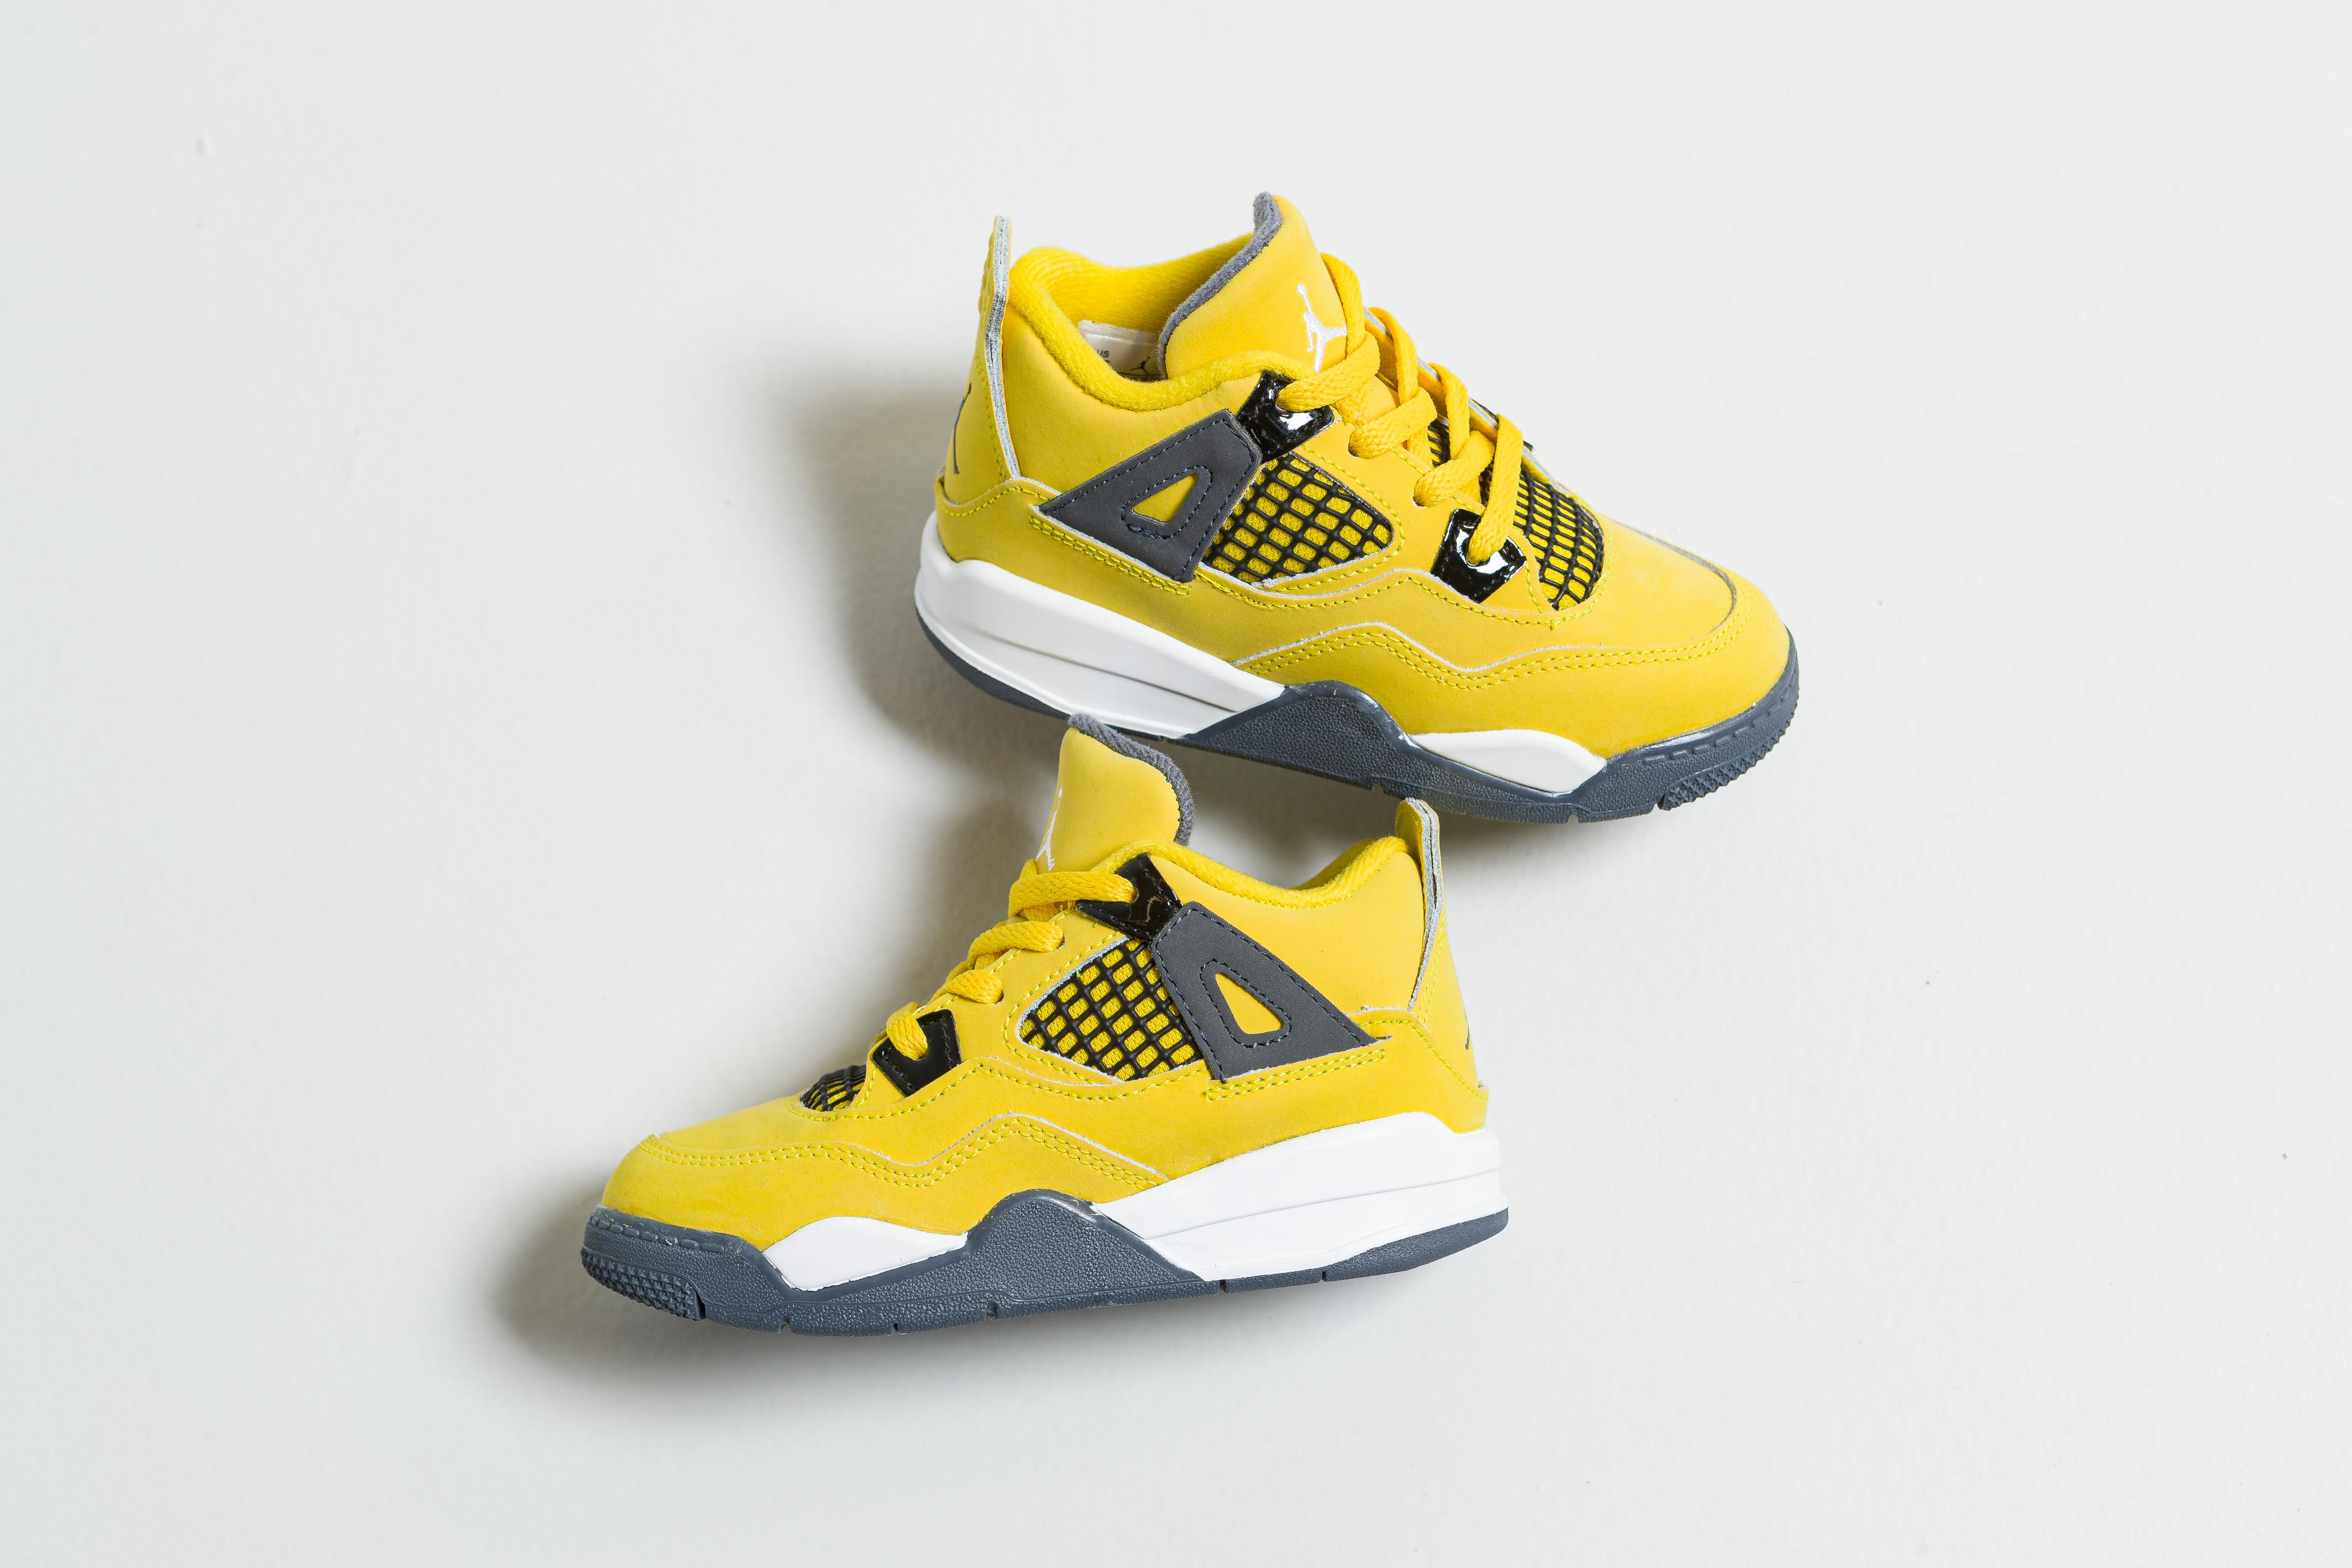 Jordan - Air Jordan 4 Retro (TD) - Tour Yellow/Dark Blue Grey-White - Up There